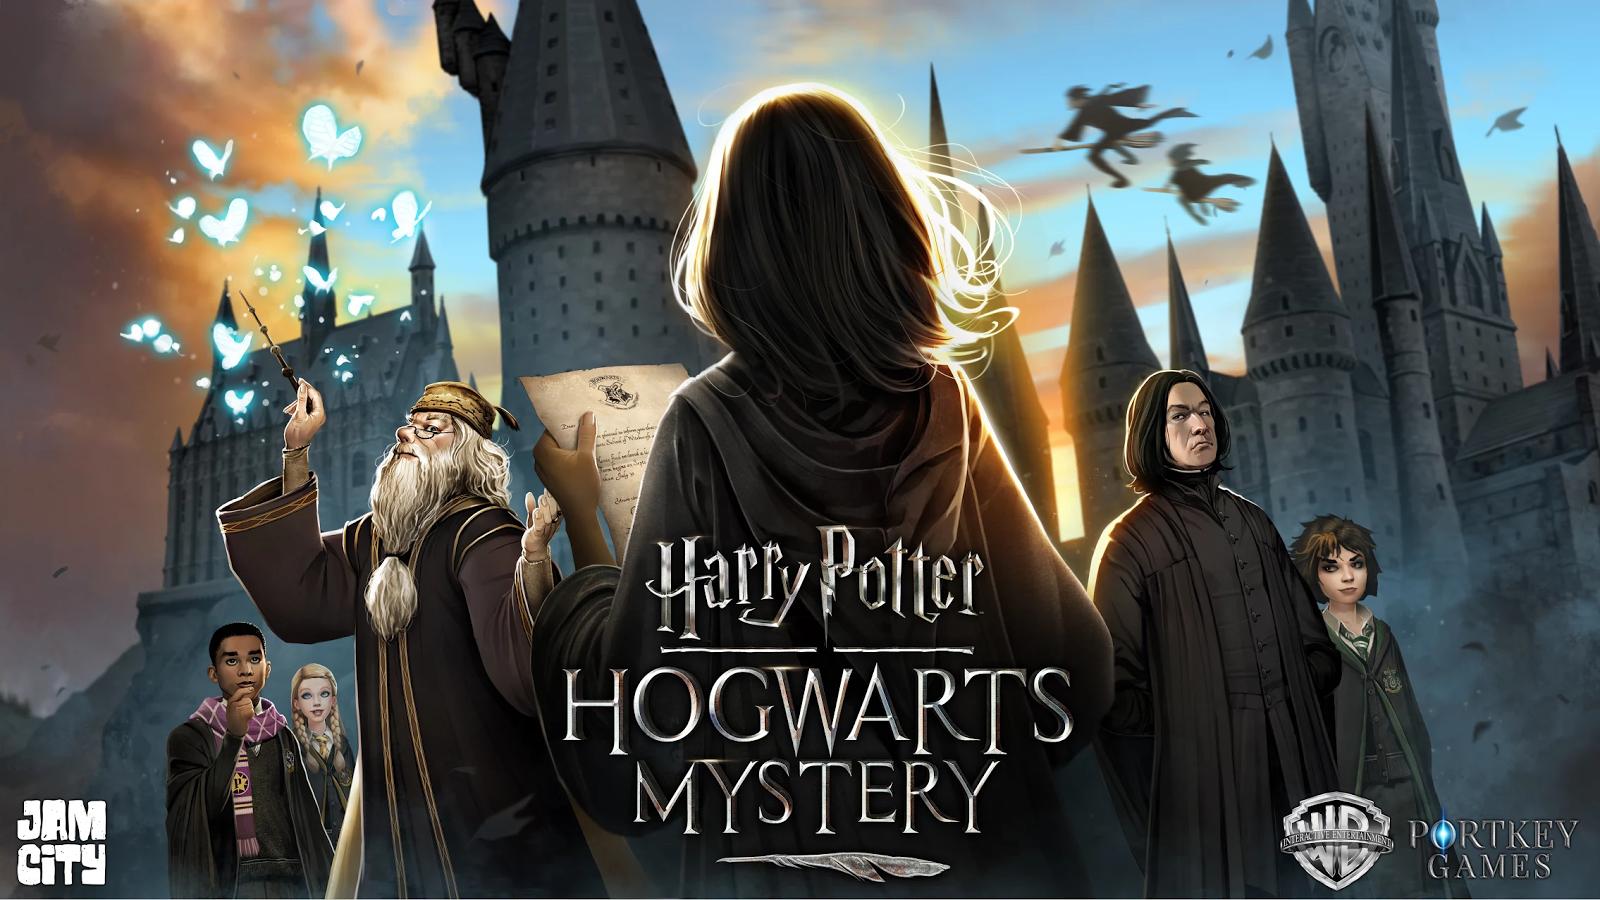 harry-potter-hogwarts-mystery-mobile-game-lets-you-design-yo_7dhd.jpg